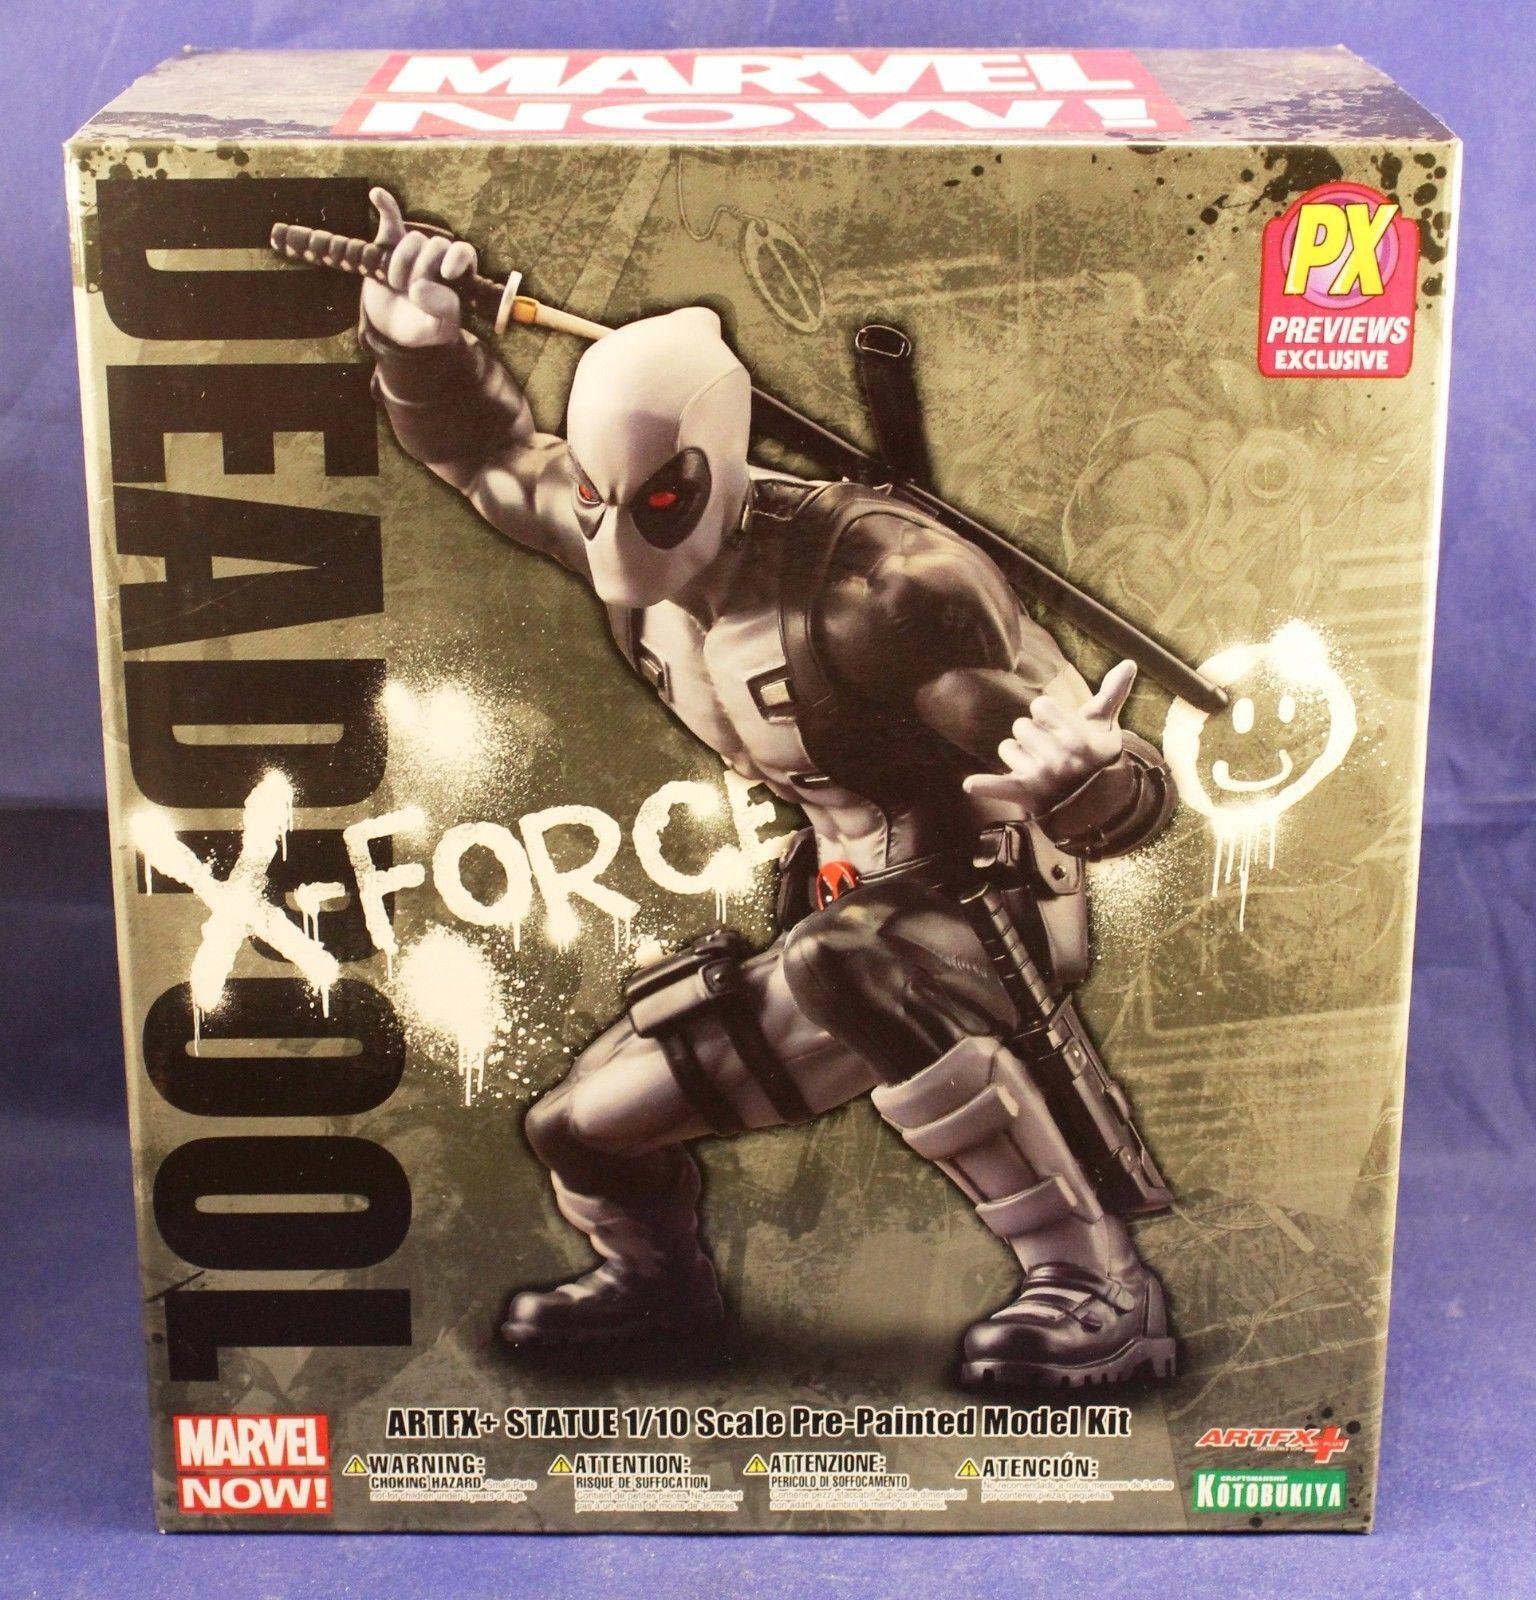 Kotobukiya ArtFx Statue Marvel Now Comics Deadpool PX Exclusive X-Force Previews